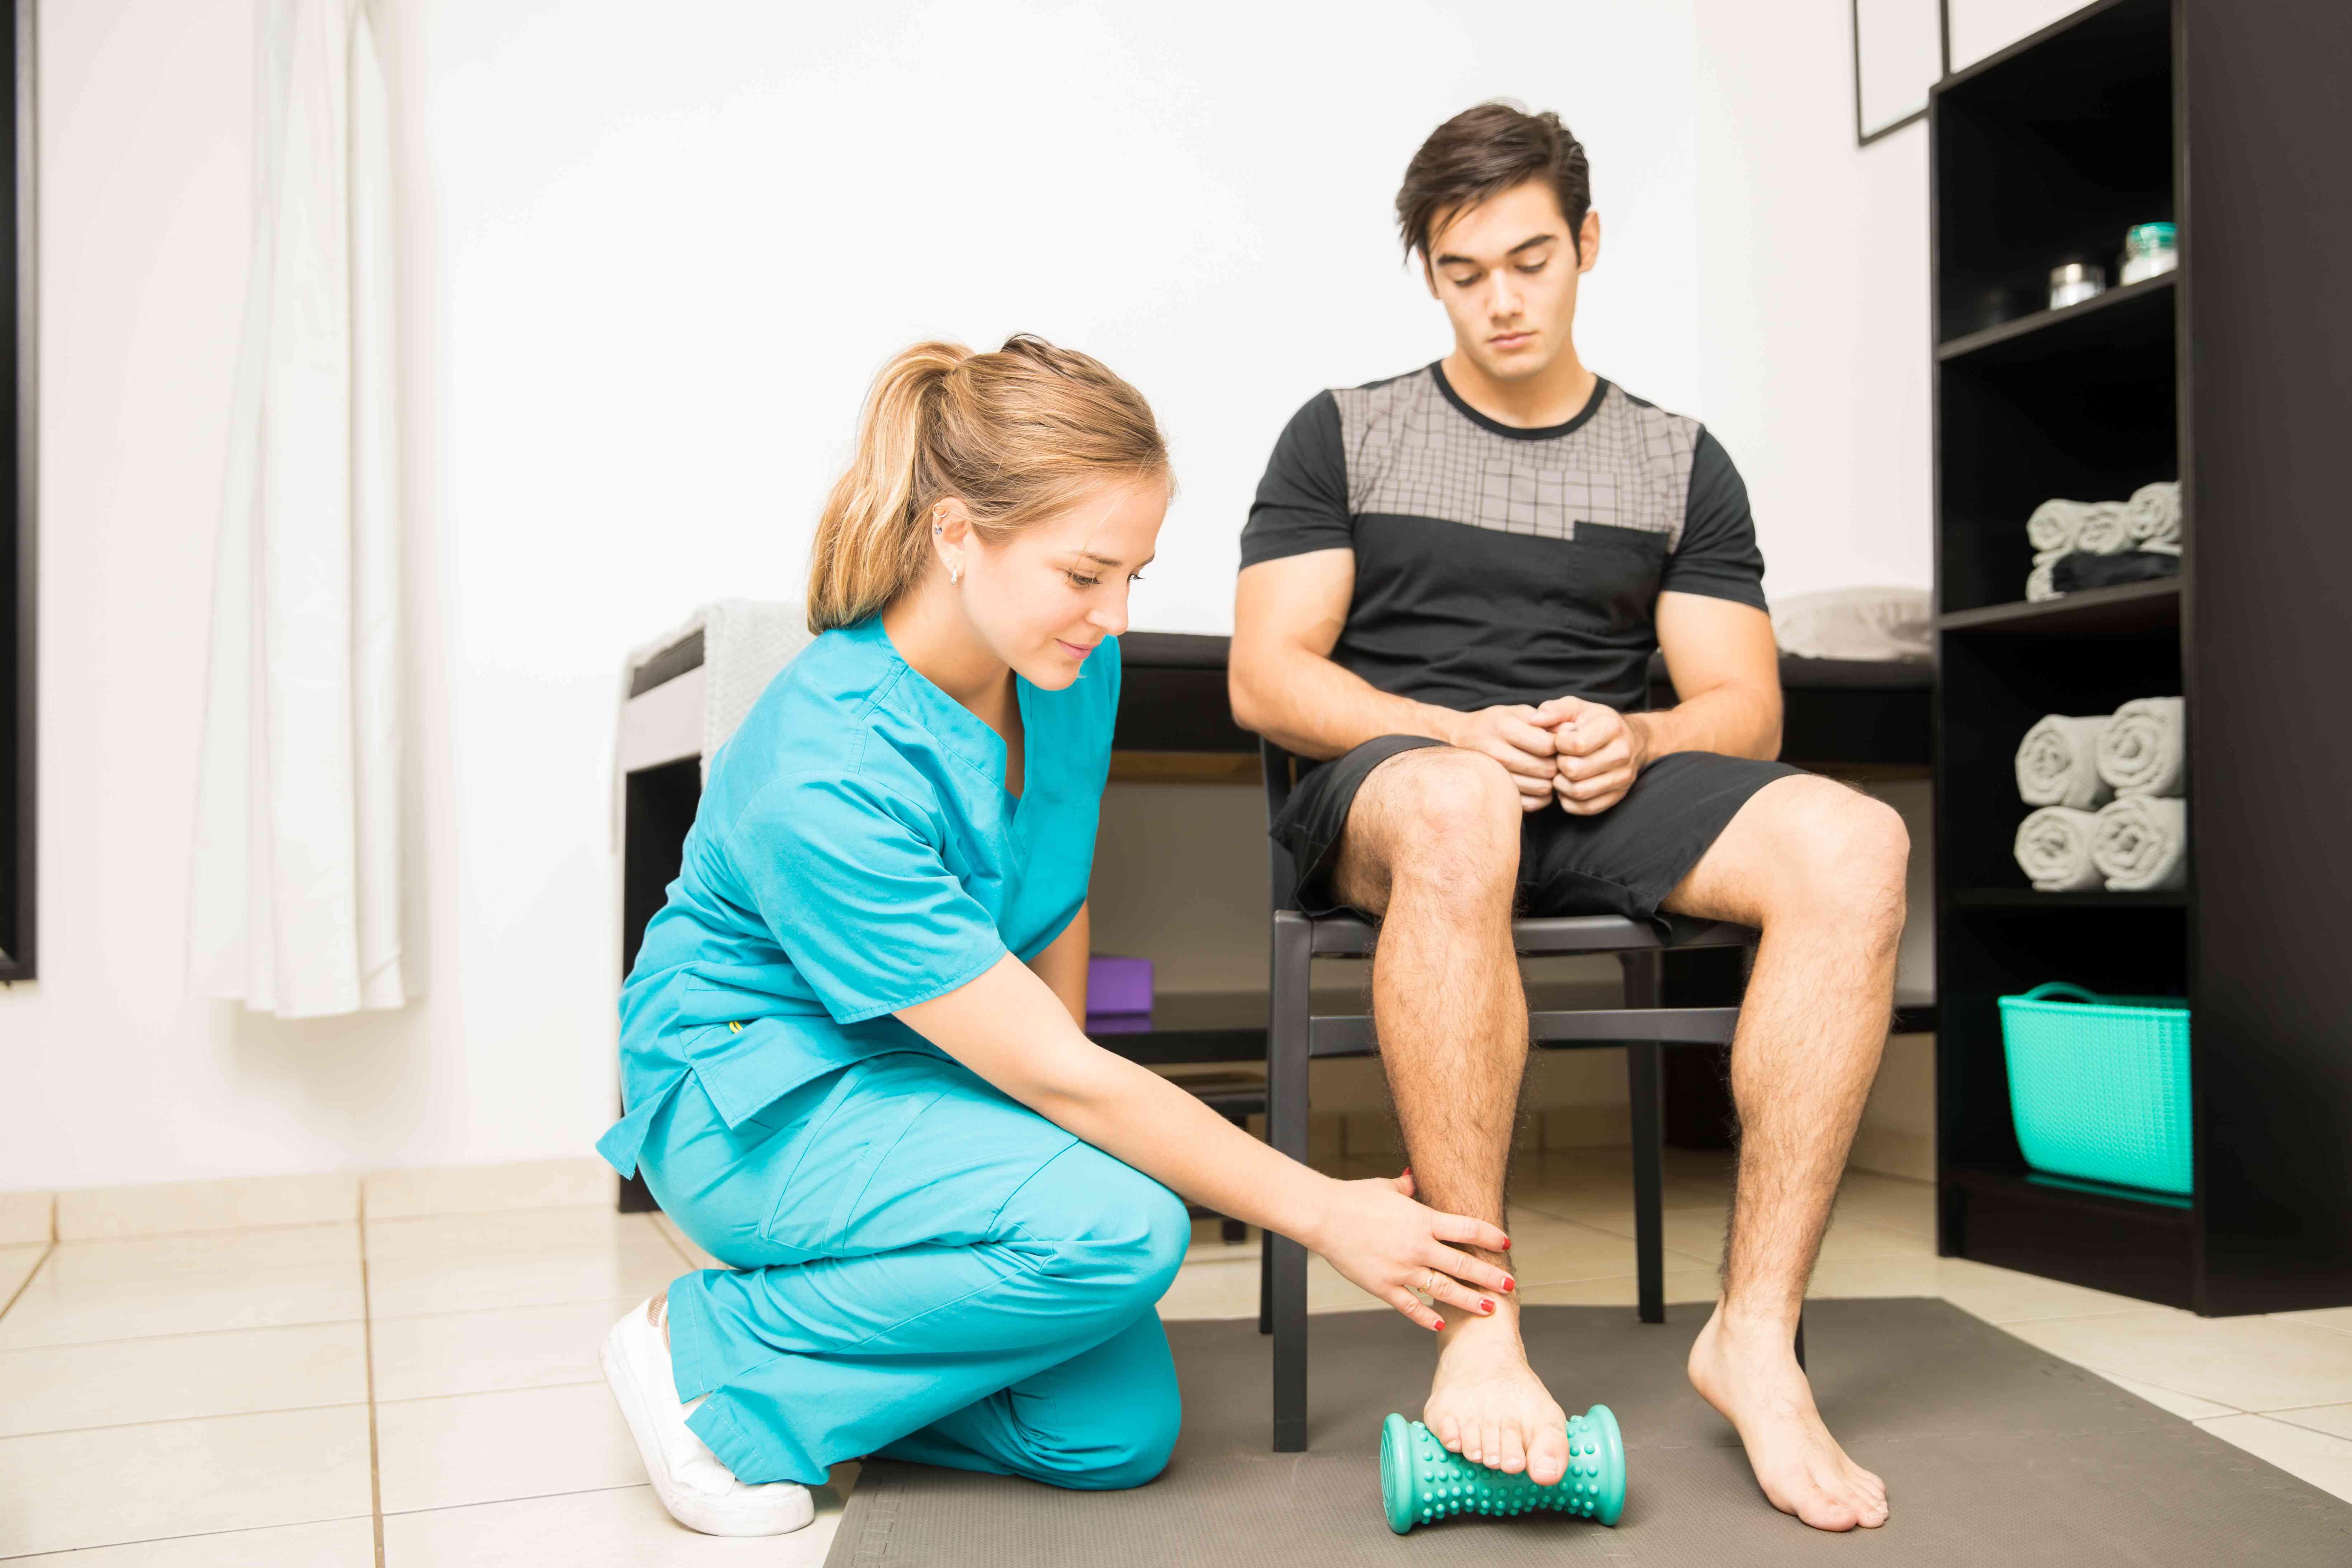 Physiotherapist Treating Plantar Fasciitis In Athlete